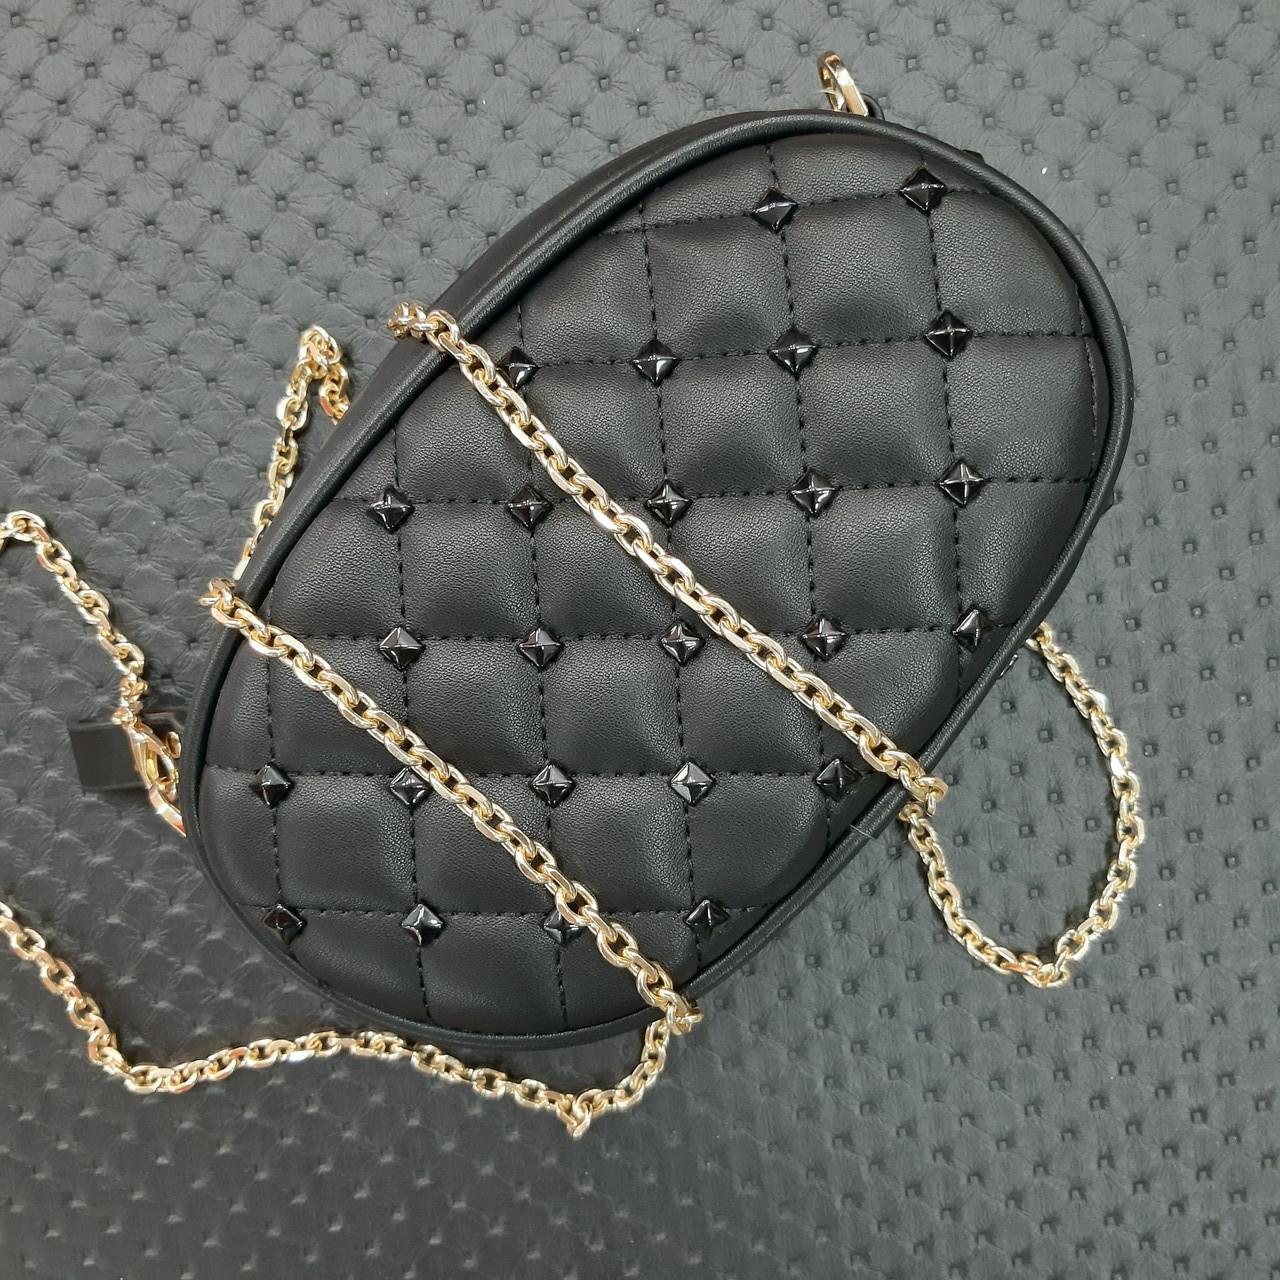 Бананка сумочка на пояс жіноча чорна